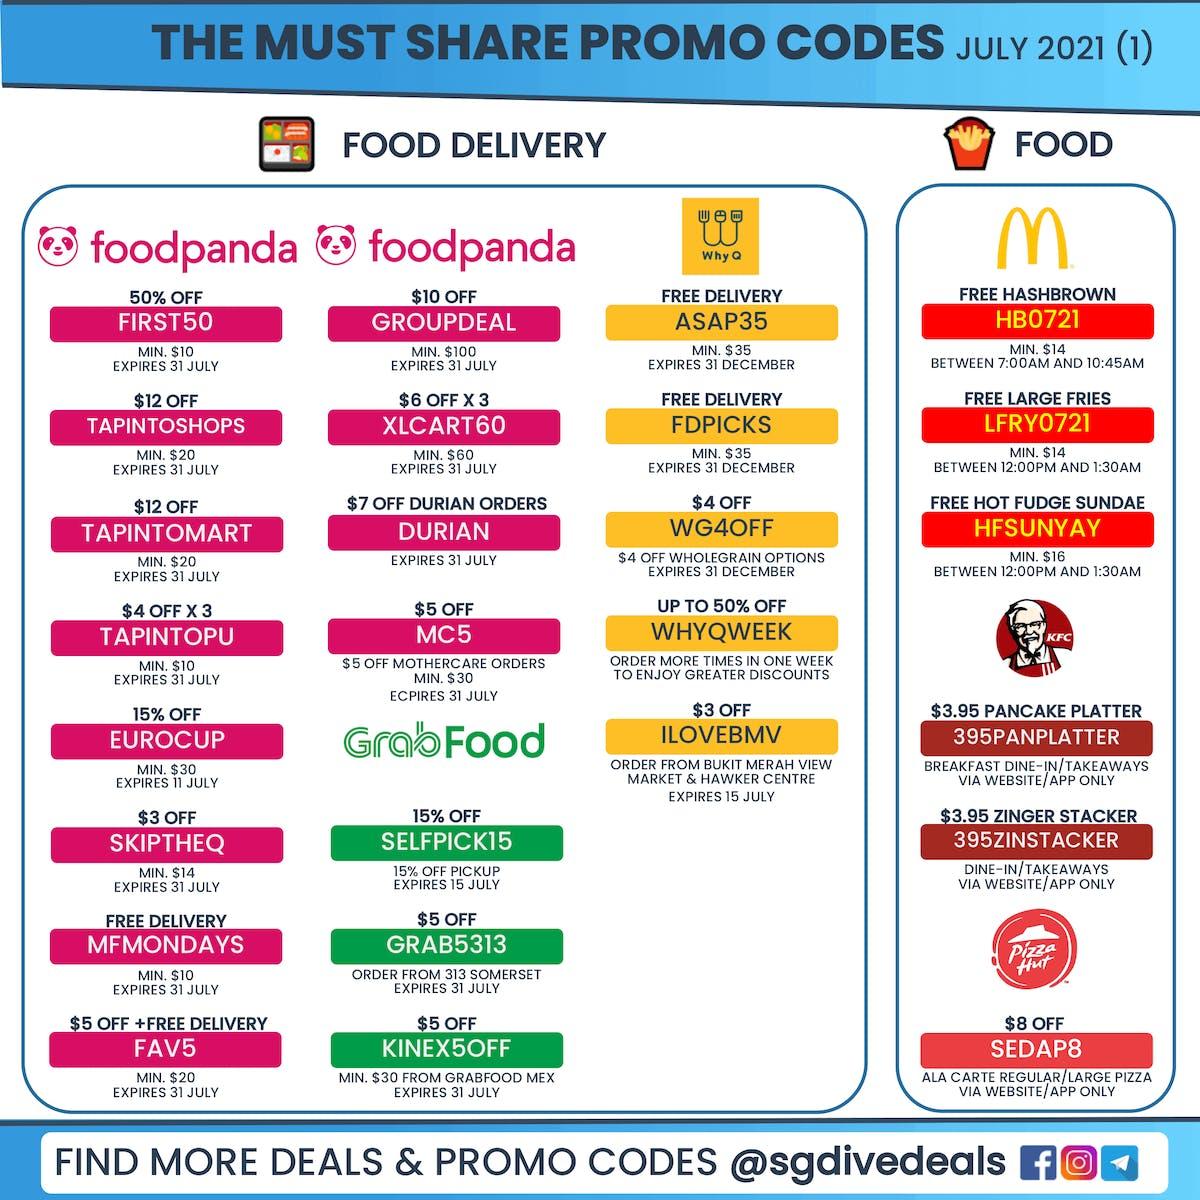 July promo codes, foodpanda, grabfood, WhyQ, mcdonald's, kfc and pizza hut